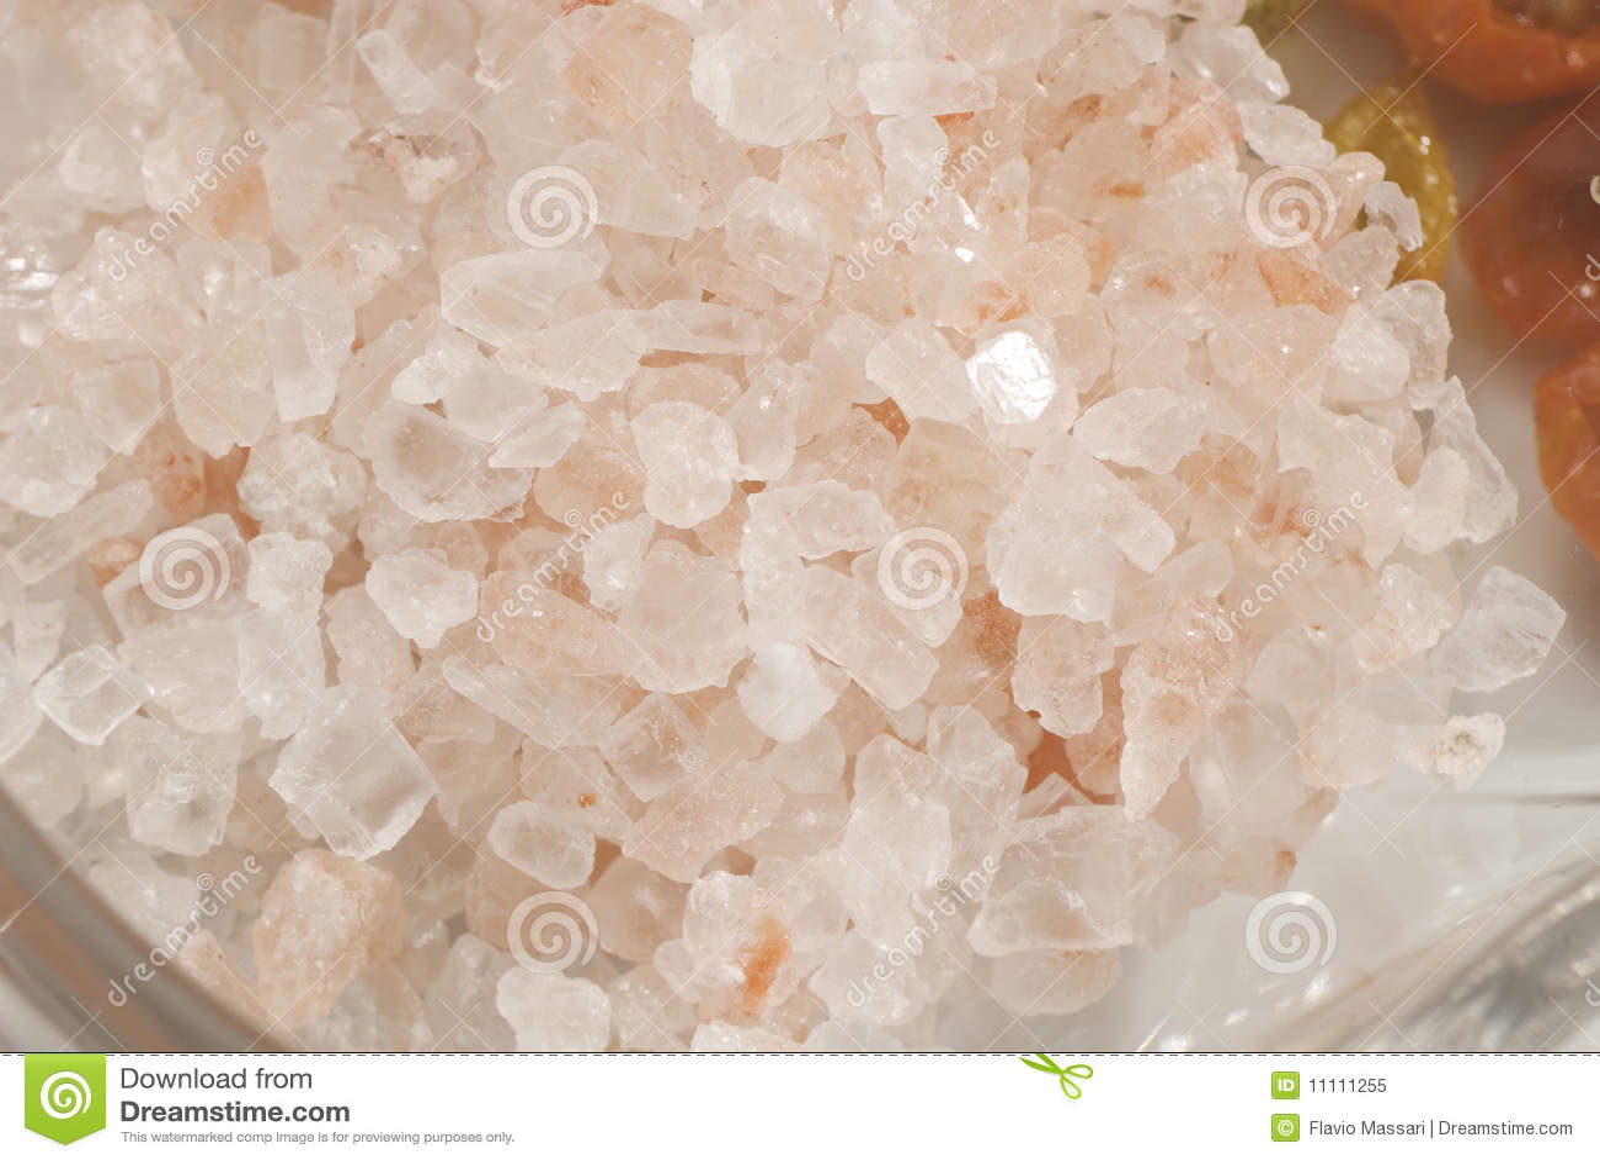 how to create salt crystals